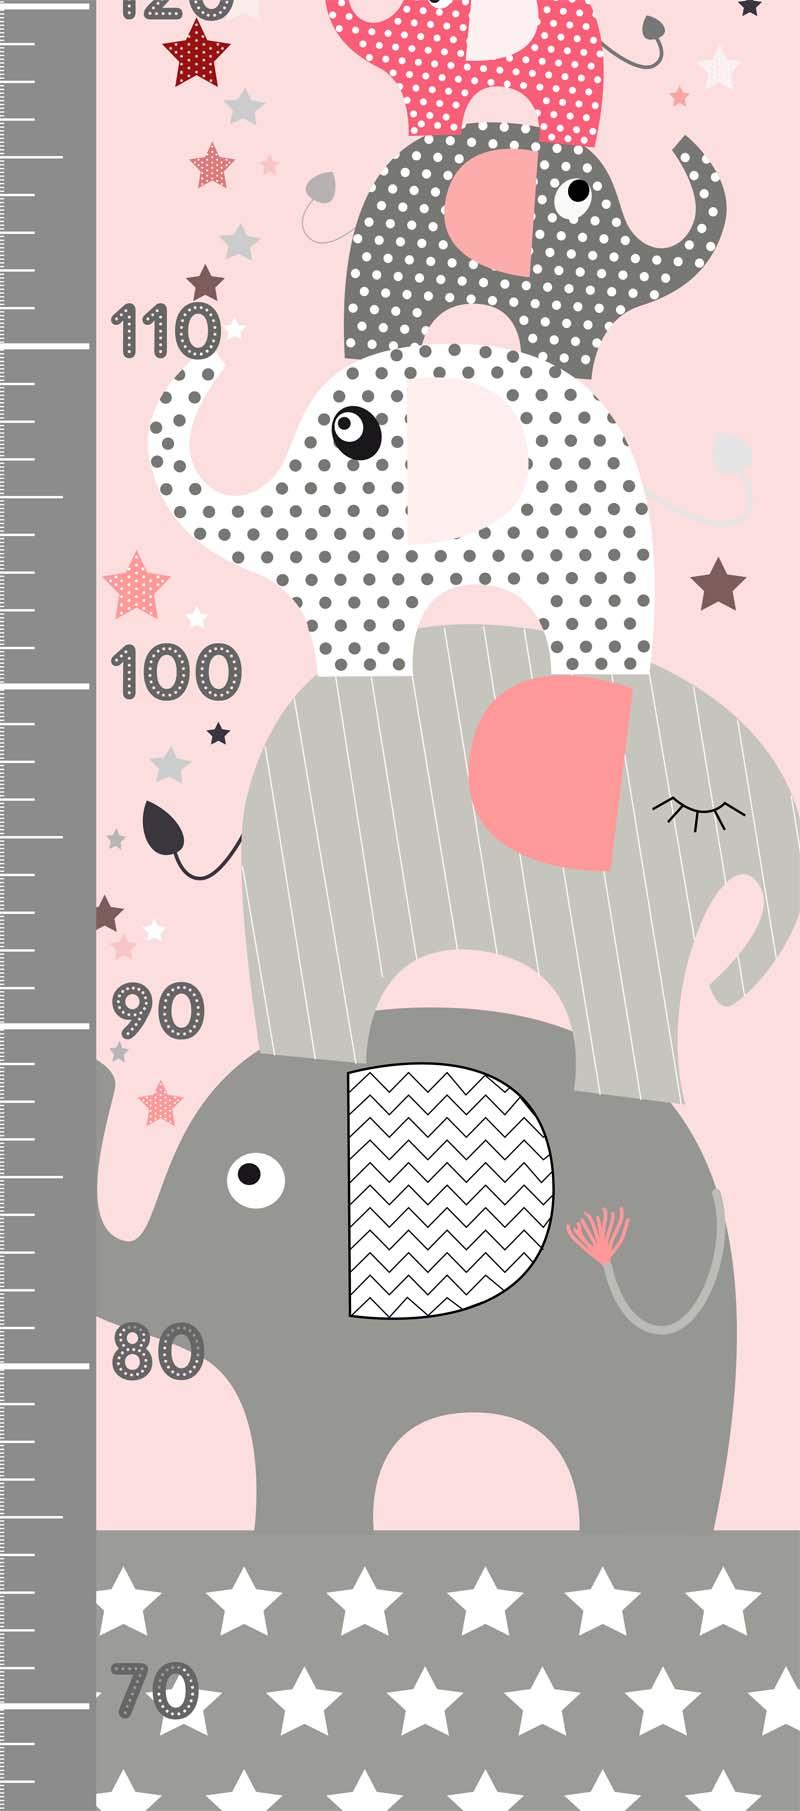 Elephant r toise 2